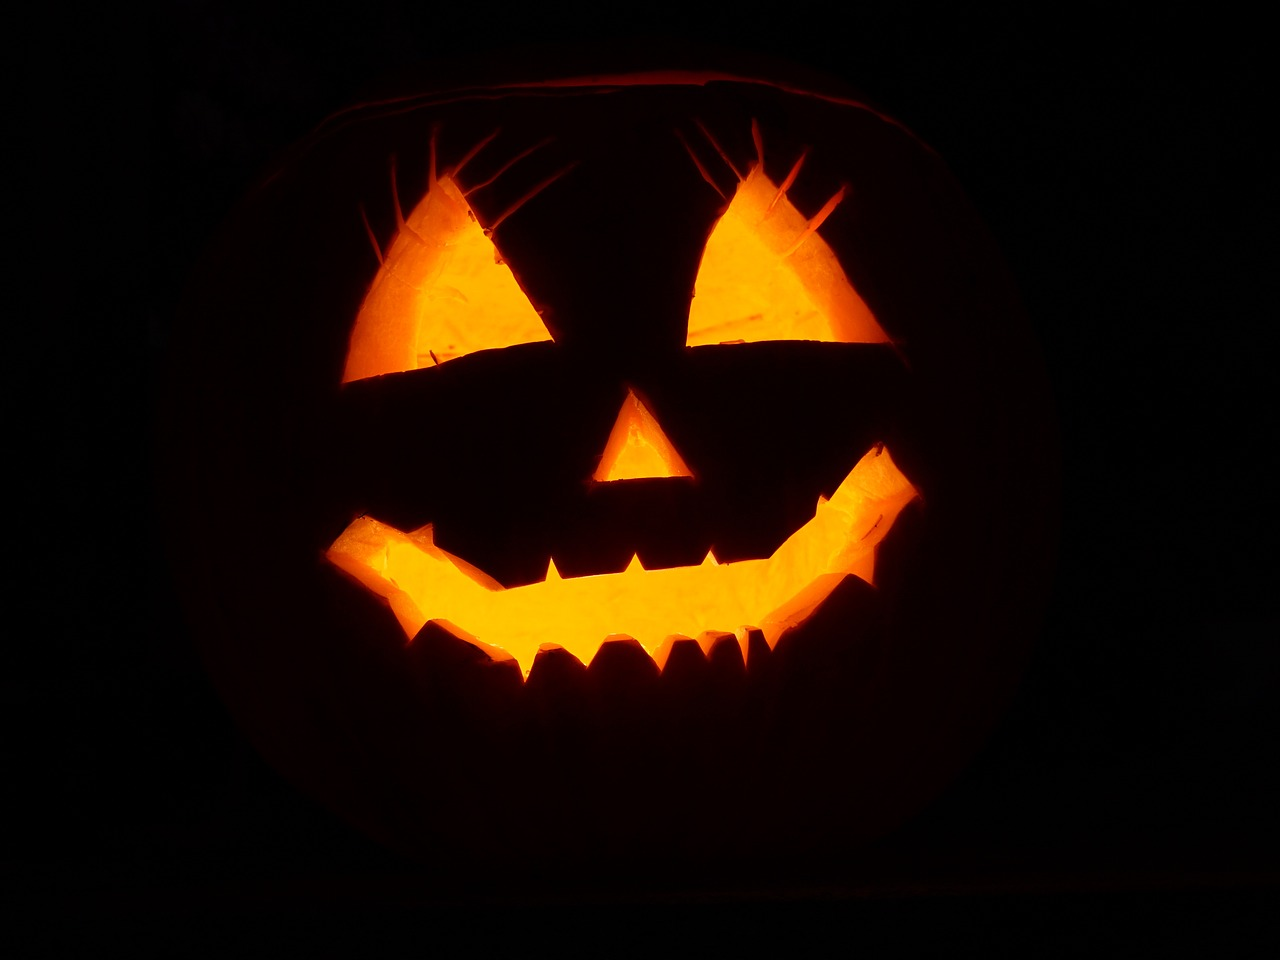 Hoe Maak Je Halloween Pompoenen.Halloween Versiering Halloween Knutselwerkjes Mamablog